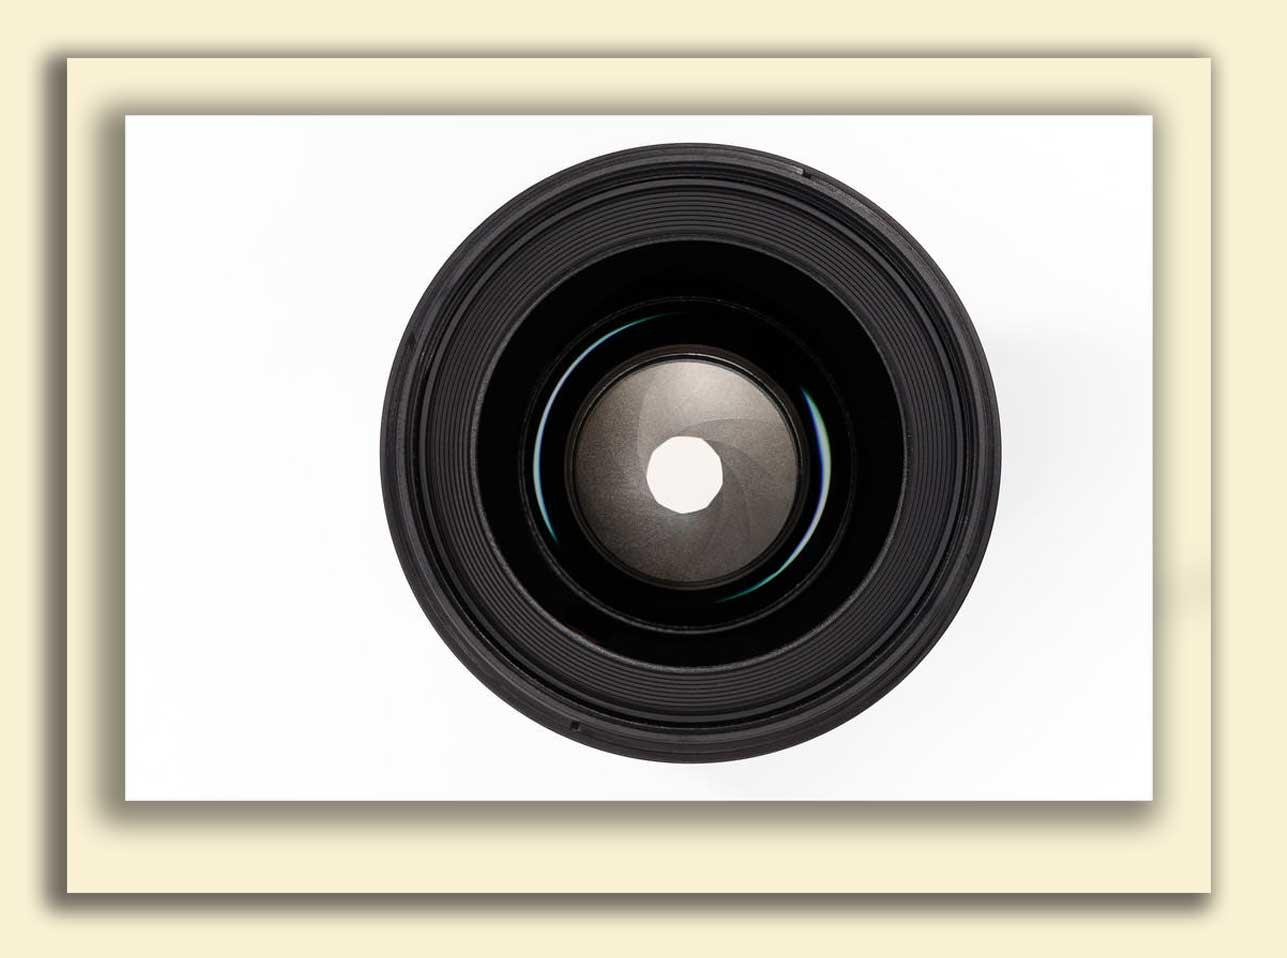 Exposure 10 - نوردهی در عکاسی چیست؟ (راهنمای مبتدیان)